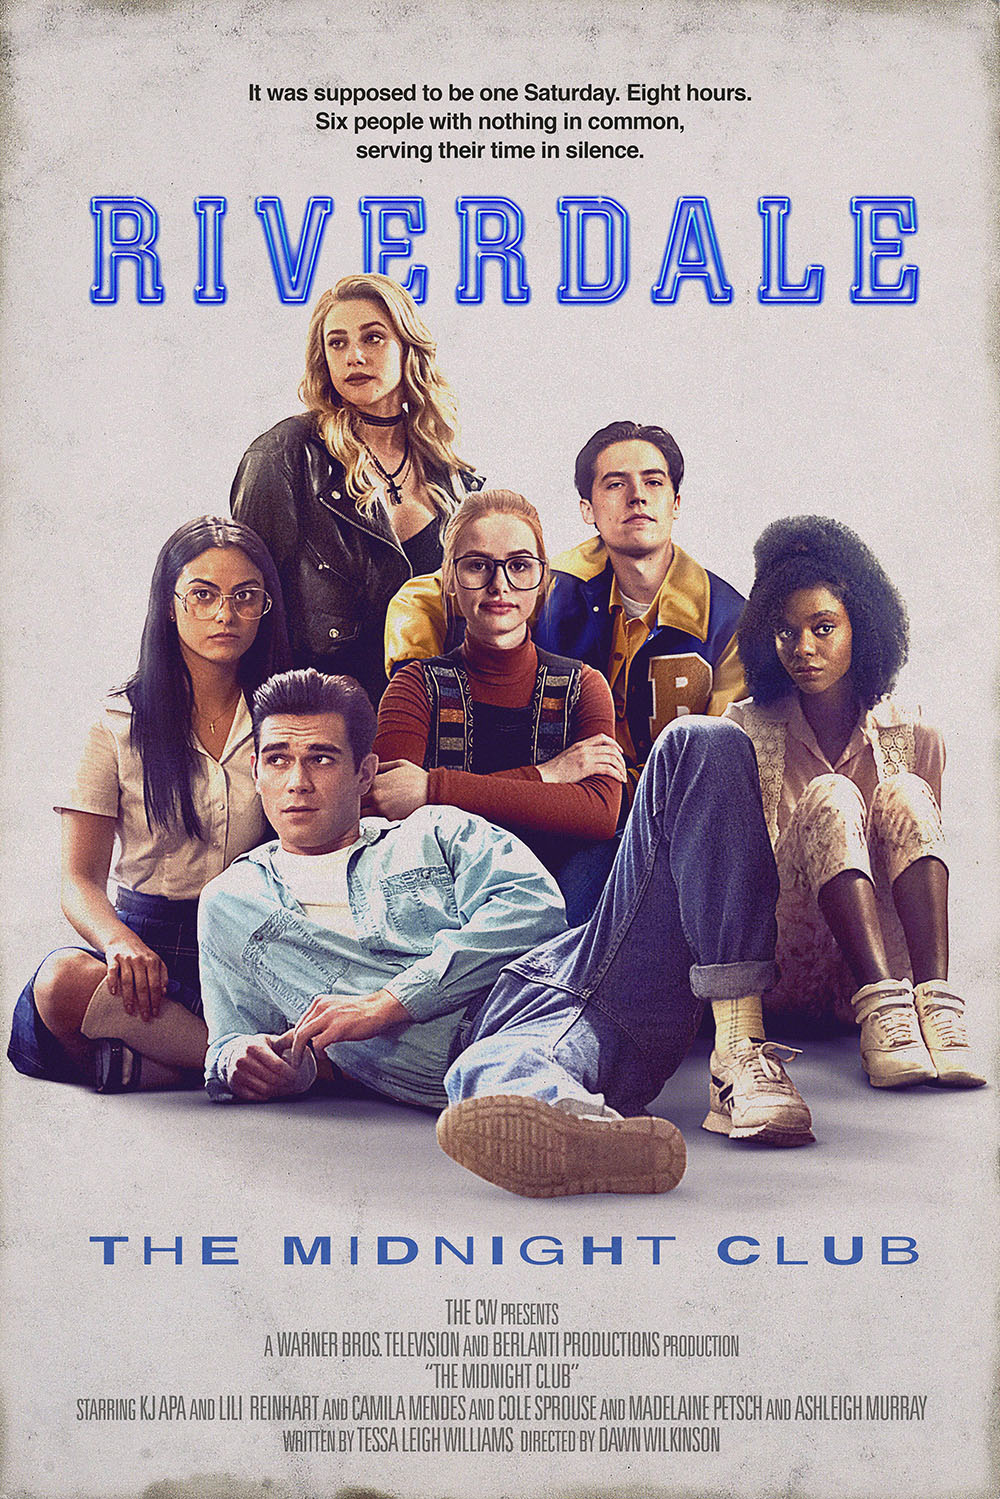 riverdale flashback episode pays